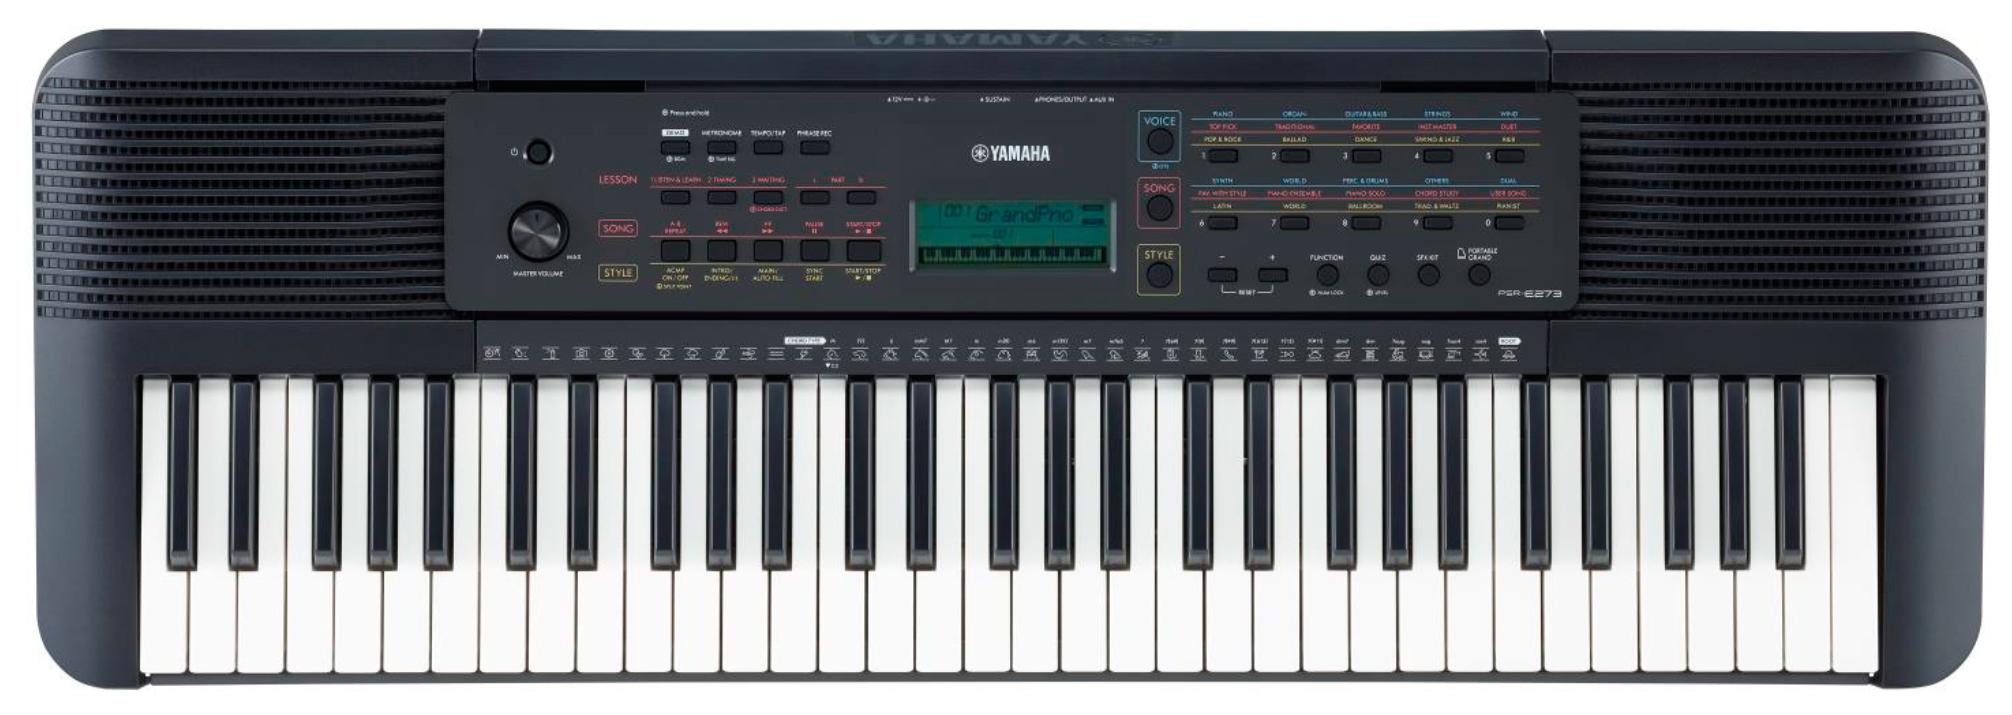 YAMAHA PSR-E273 синтезатор с автоакк. 61клавиша